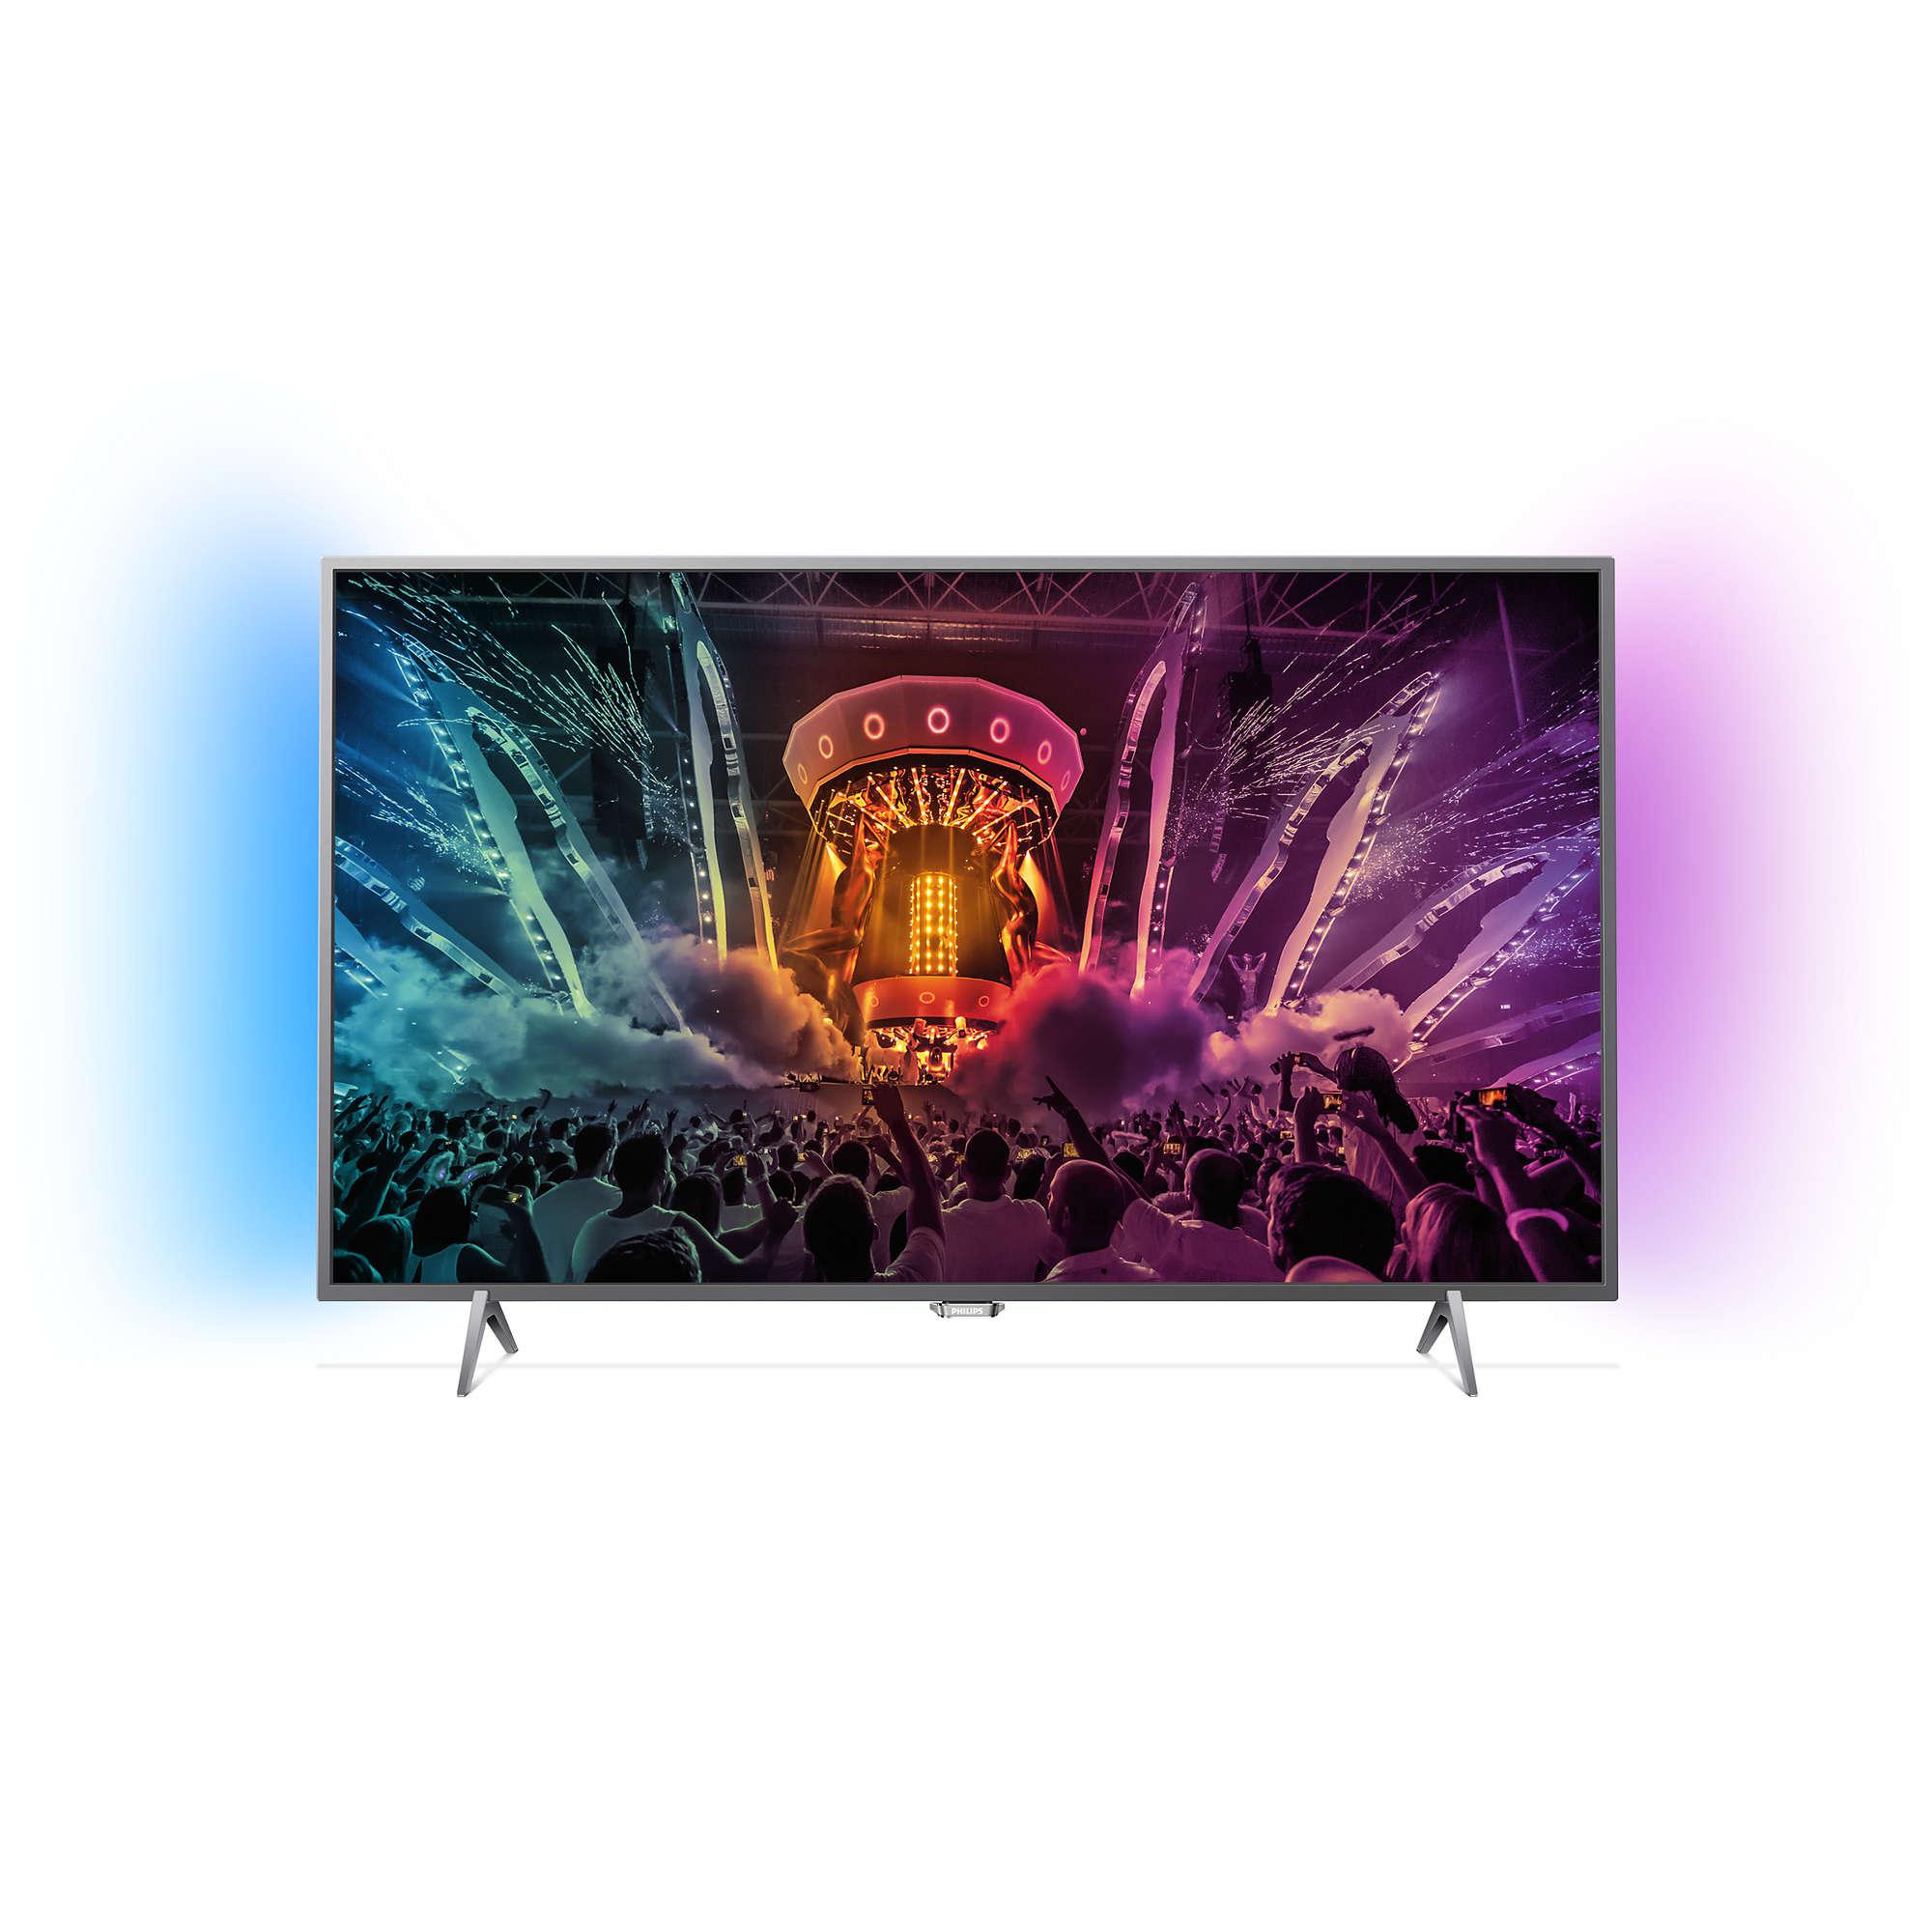 טלוויזיה ''49 LED 4K ANDROID Philips דגם 49PUS6401